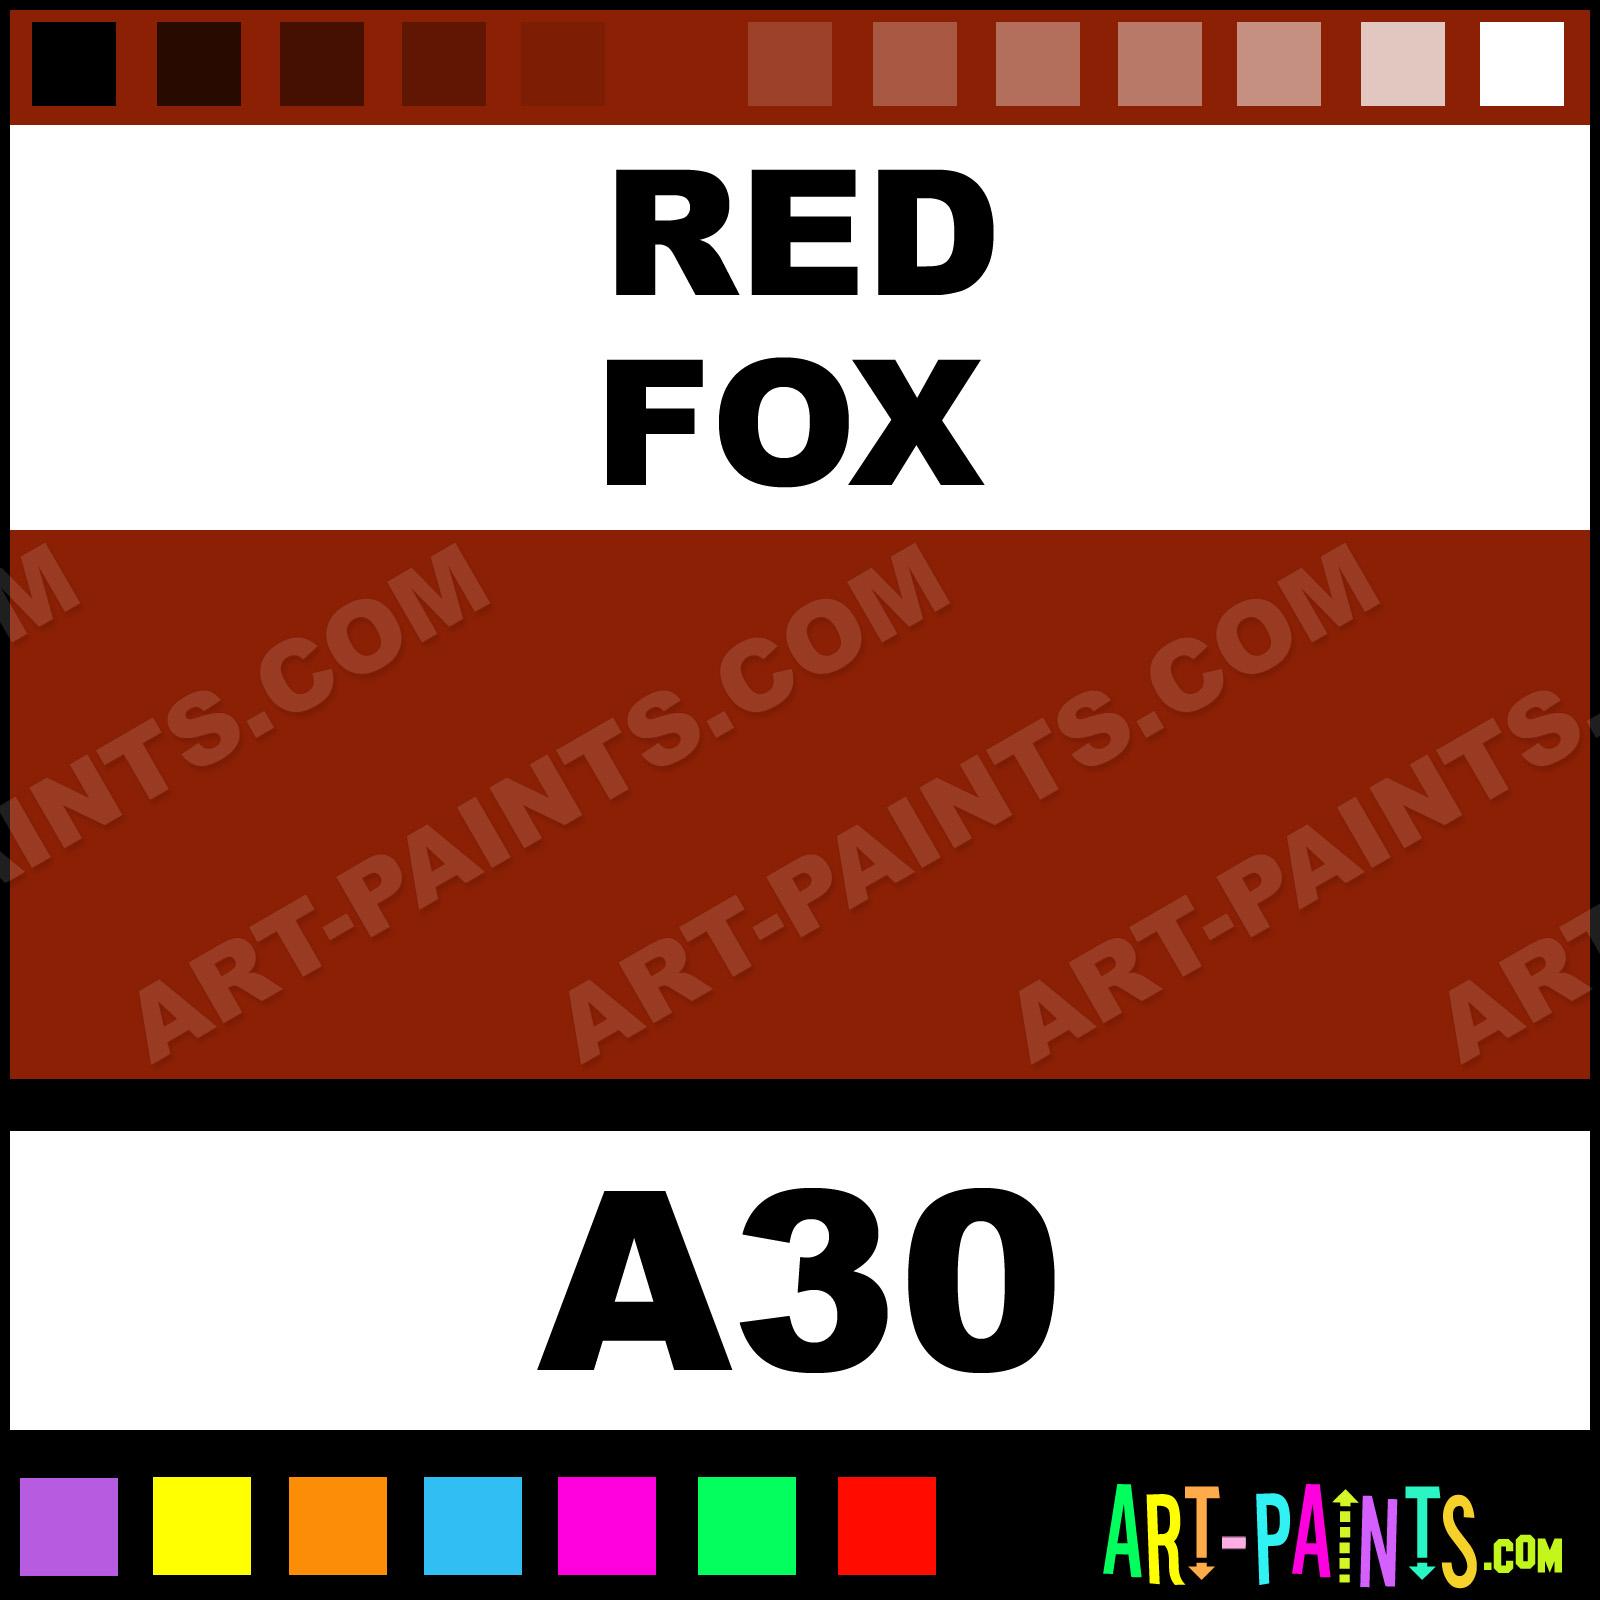 Red Fox Casual Colors Spray Paints - Aerosol Decorative